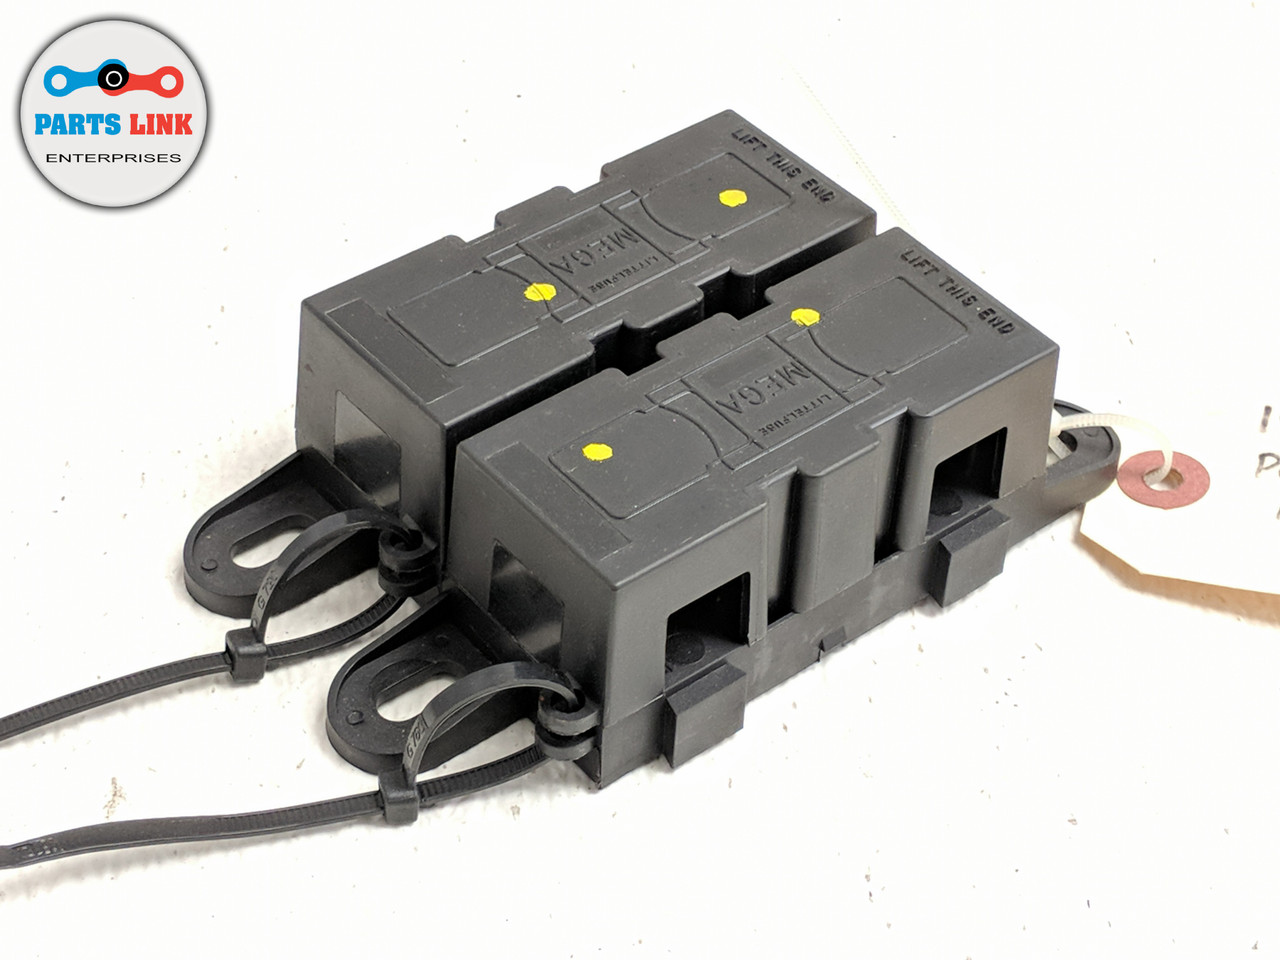 2014-2016 RANGE ROVER SPORT L494 POSITIVE BATTERY CABLE TERMINAL MEGA FUSE  BOX - PARTS LINK ENT | Battery Cable To Fuse Box |  | Parts Link Enterprise